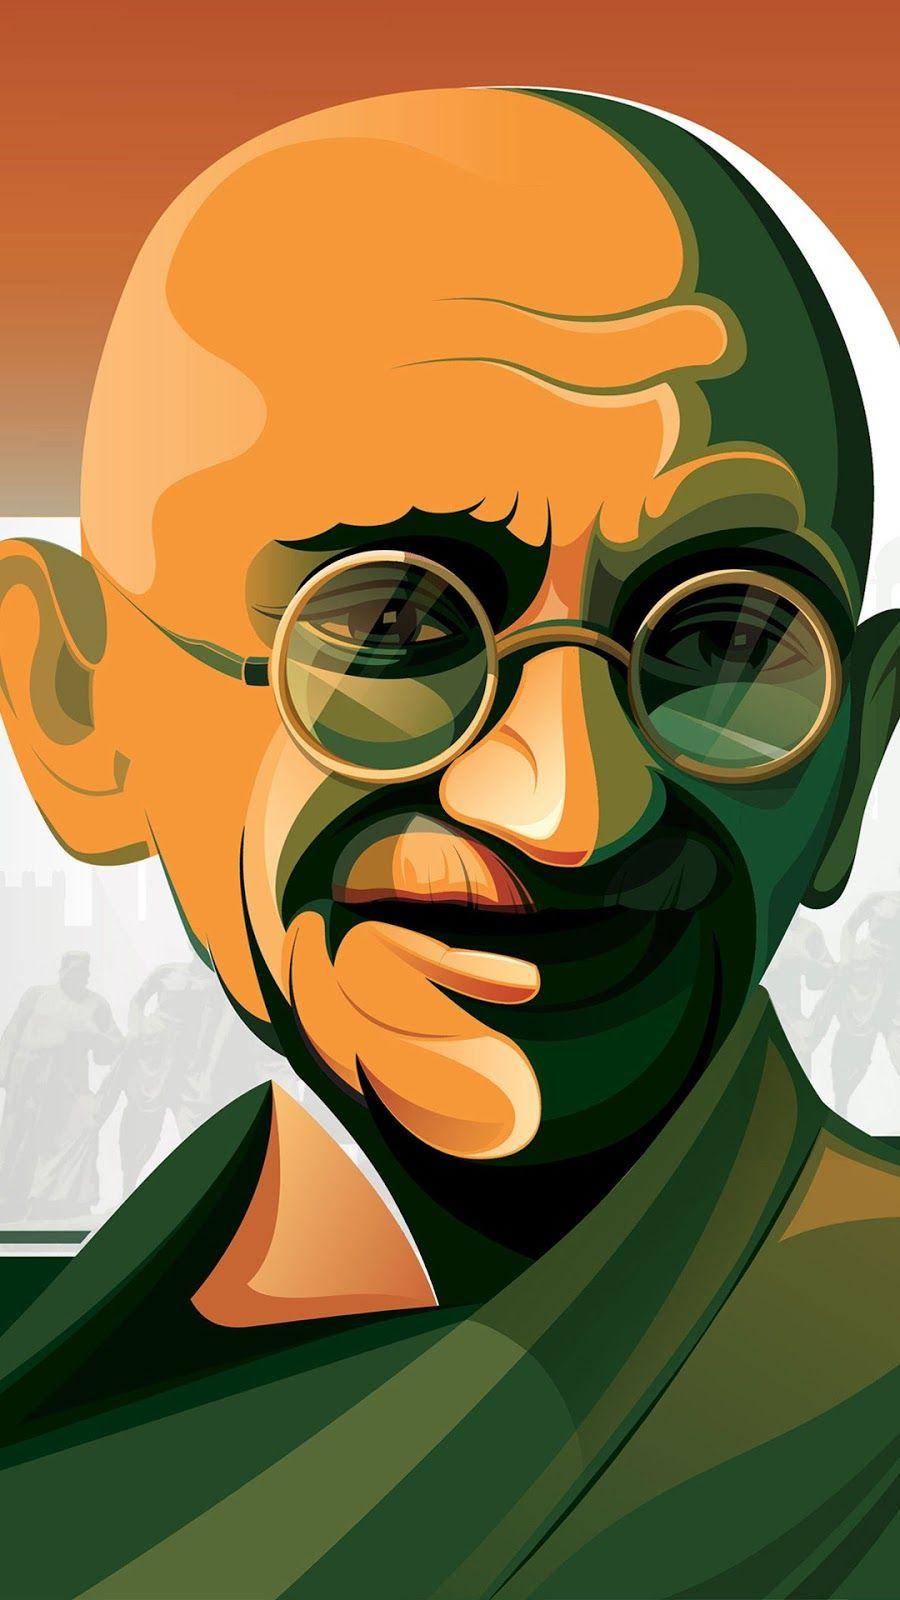 Mahatma Gandhi Hd 4k Art Power Of Love Quotes Mahatma Gandhi Pretty Inspirational Quotes